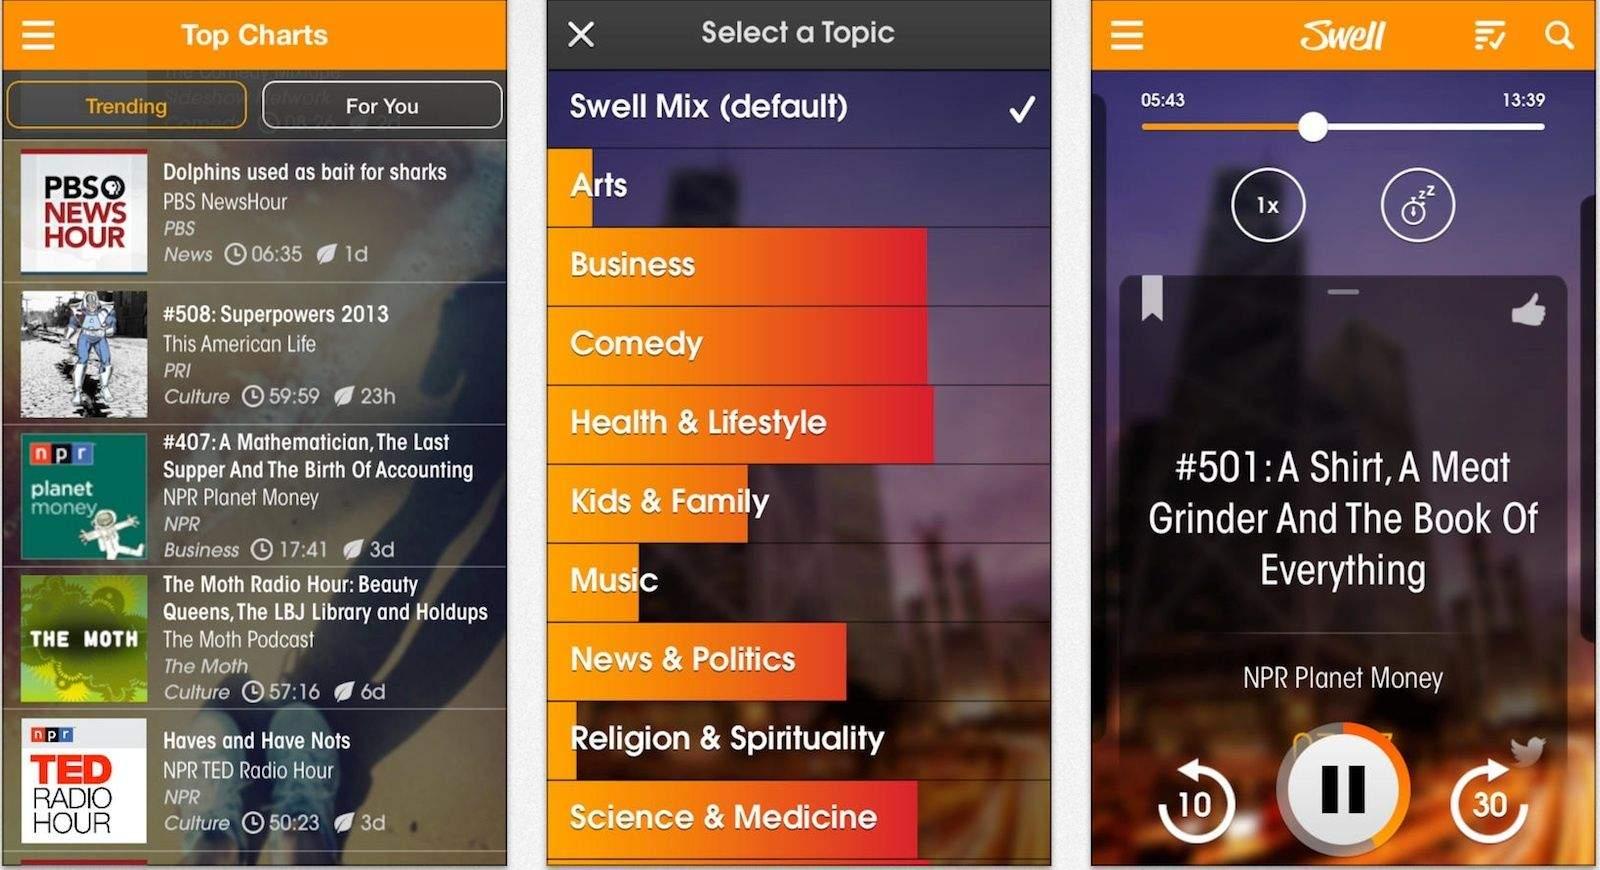 Swell Radio App Is Pandora For Talk, Sports And News Radio